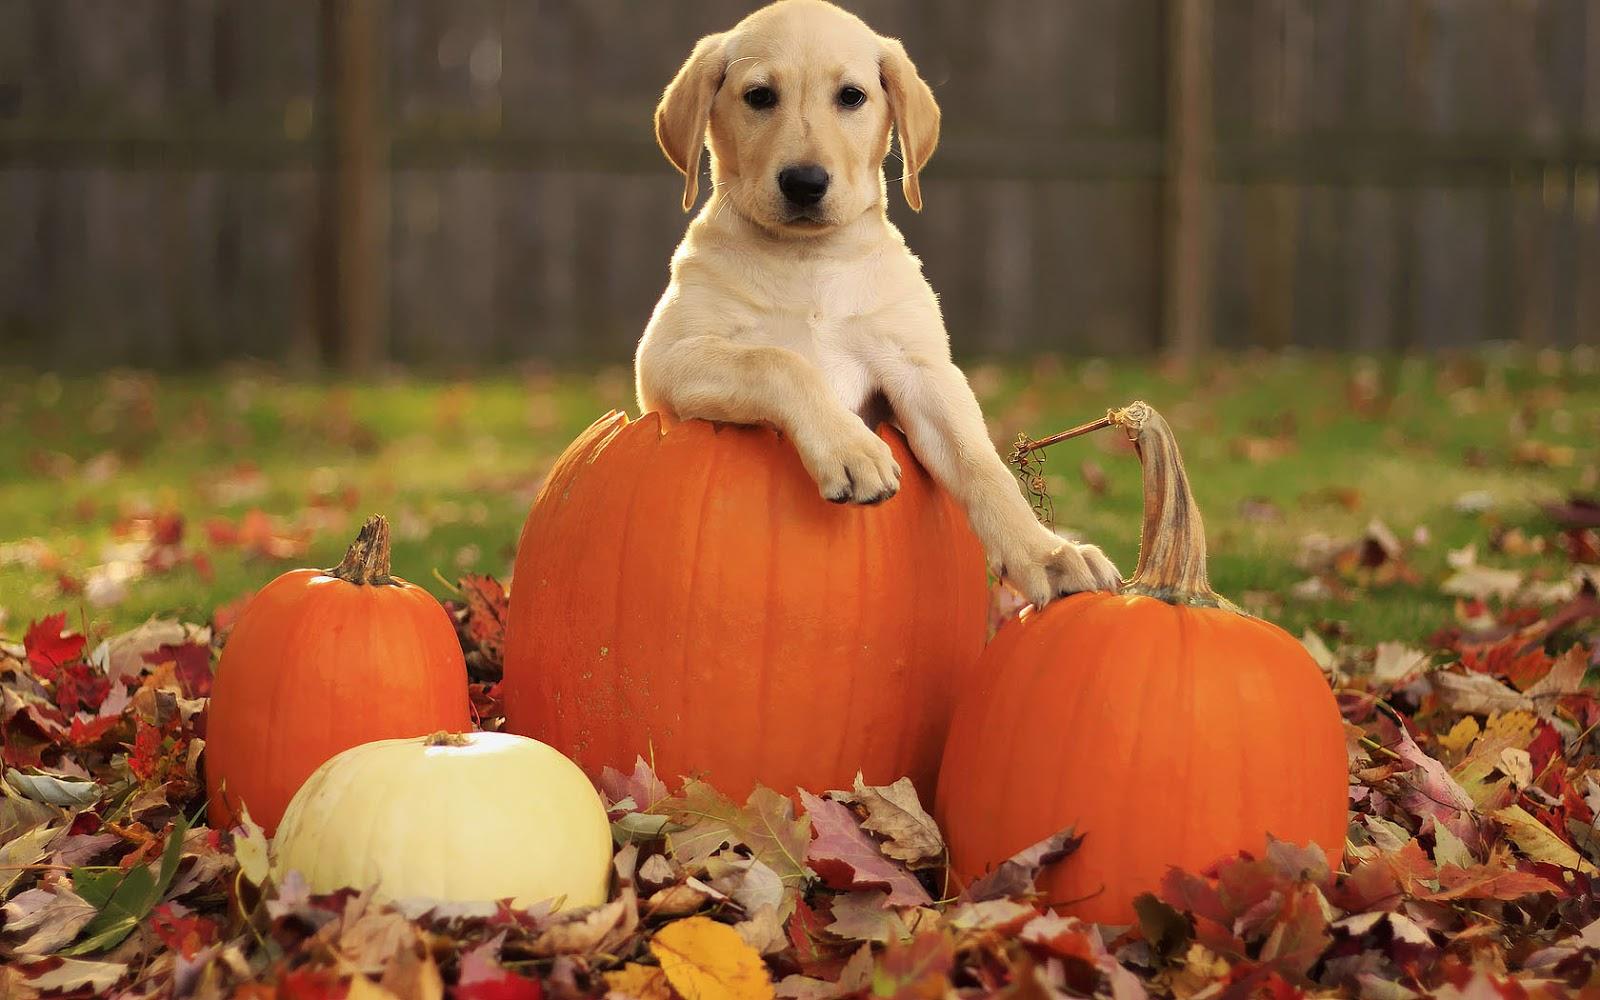 Autumn wallpaper with a dog in a Halloween pumpkin HD dog background 1600x1000